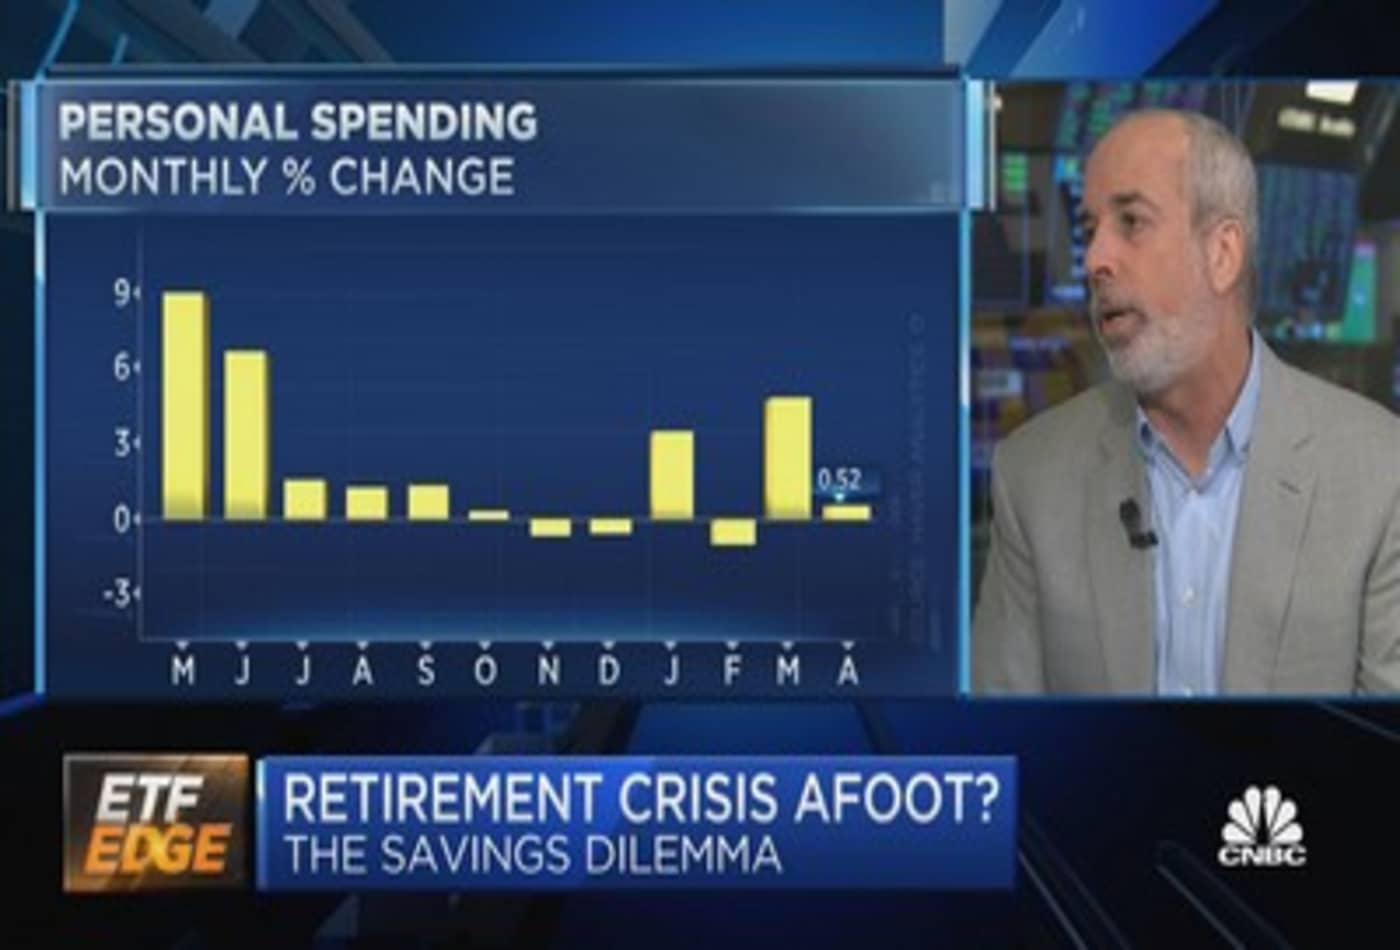 Retirement crisis afoot? Unpacking the nationwide savings dilemma